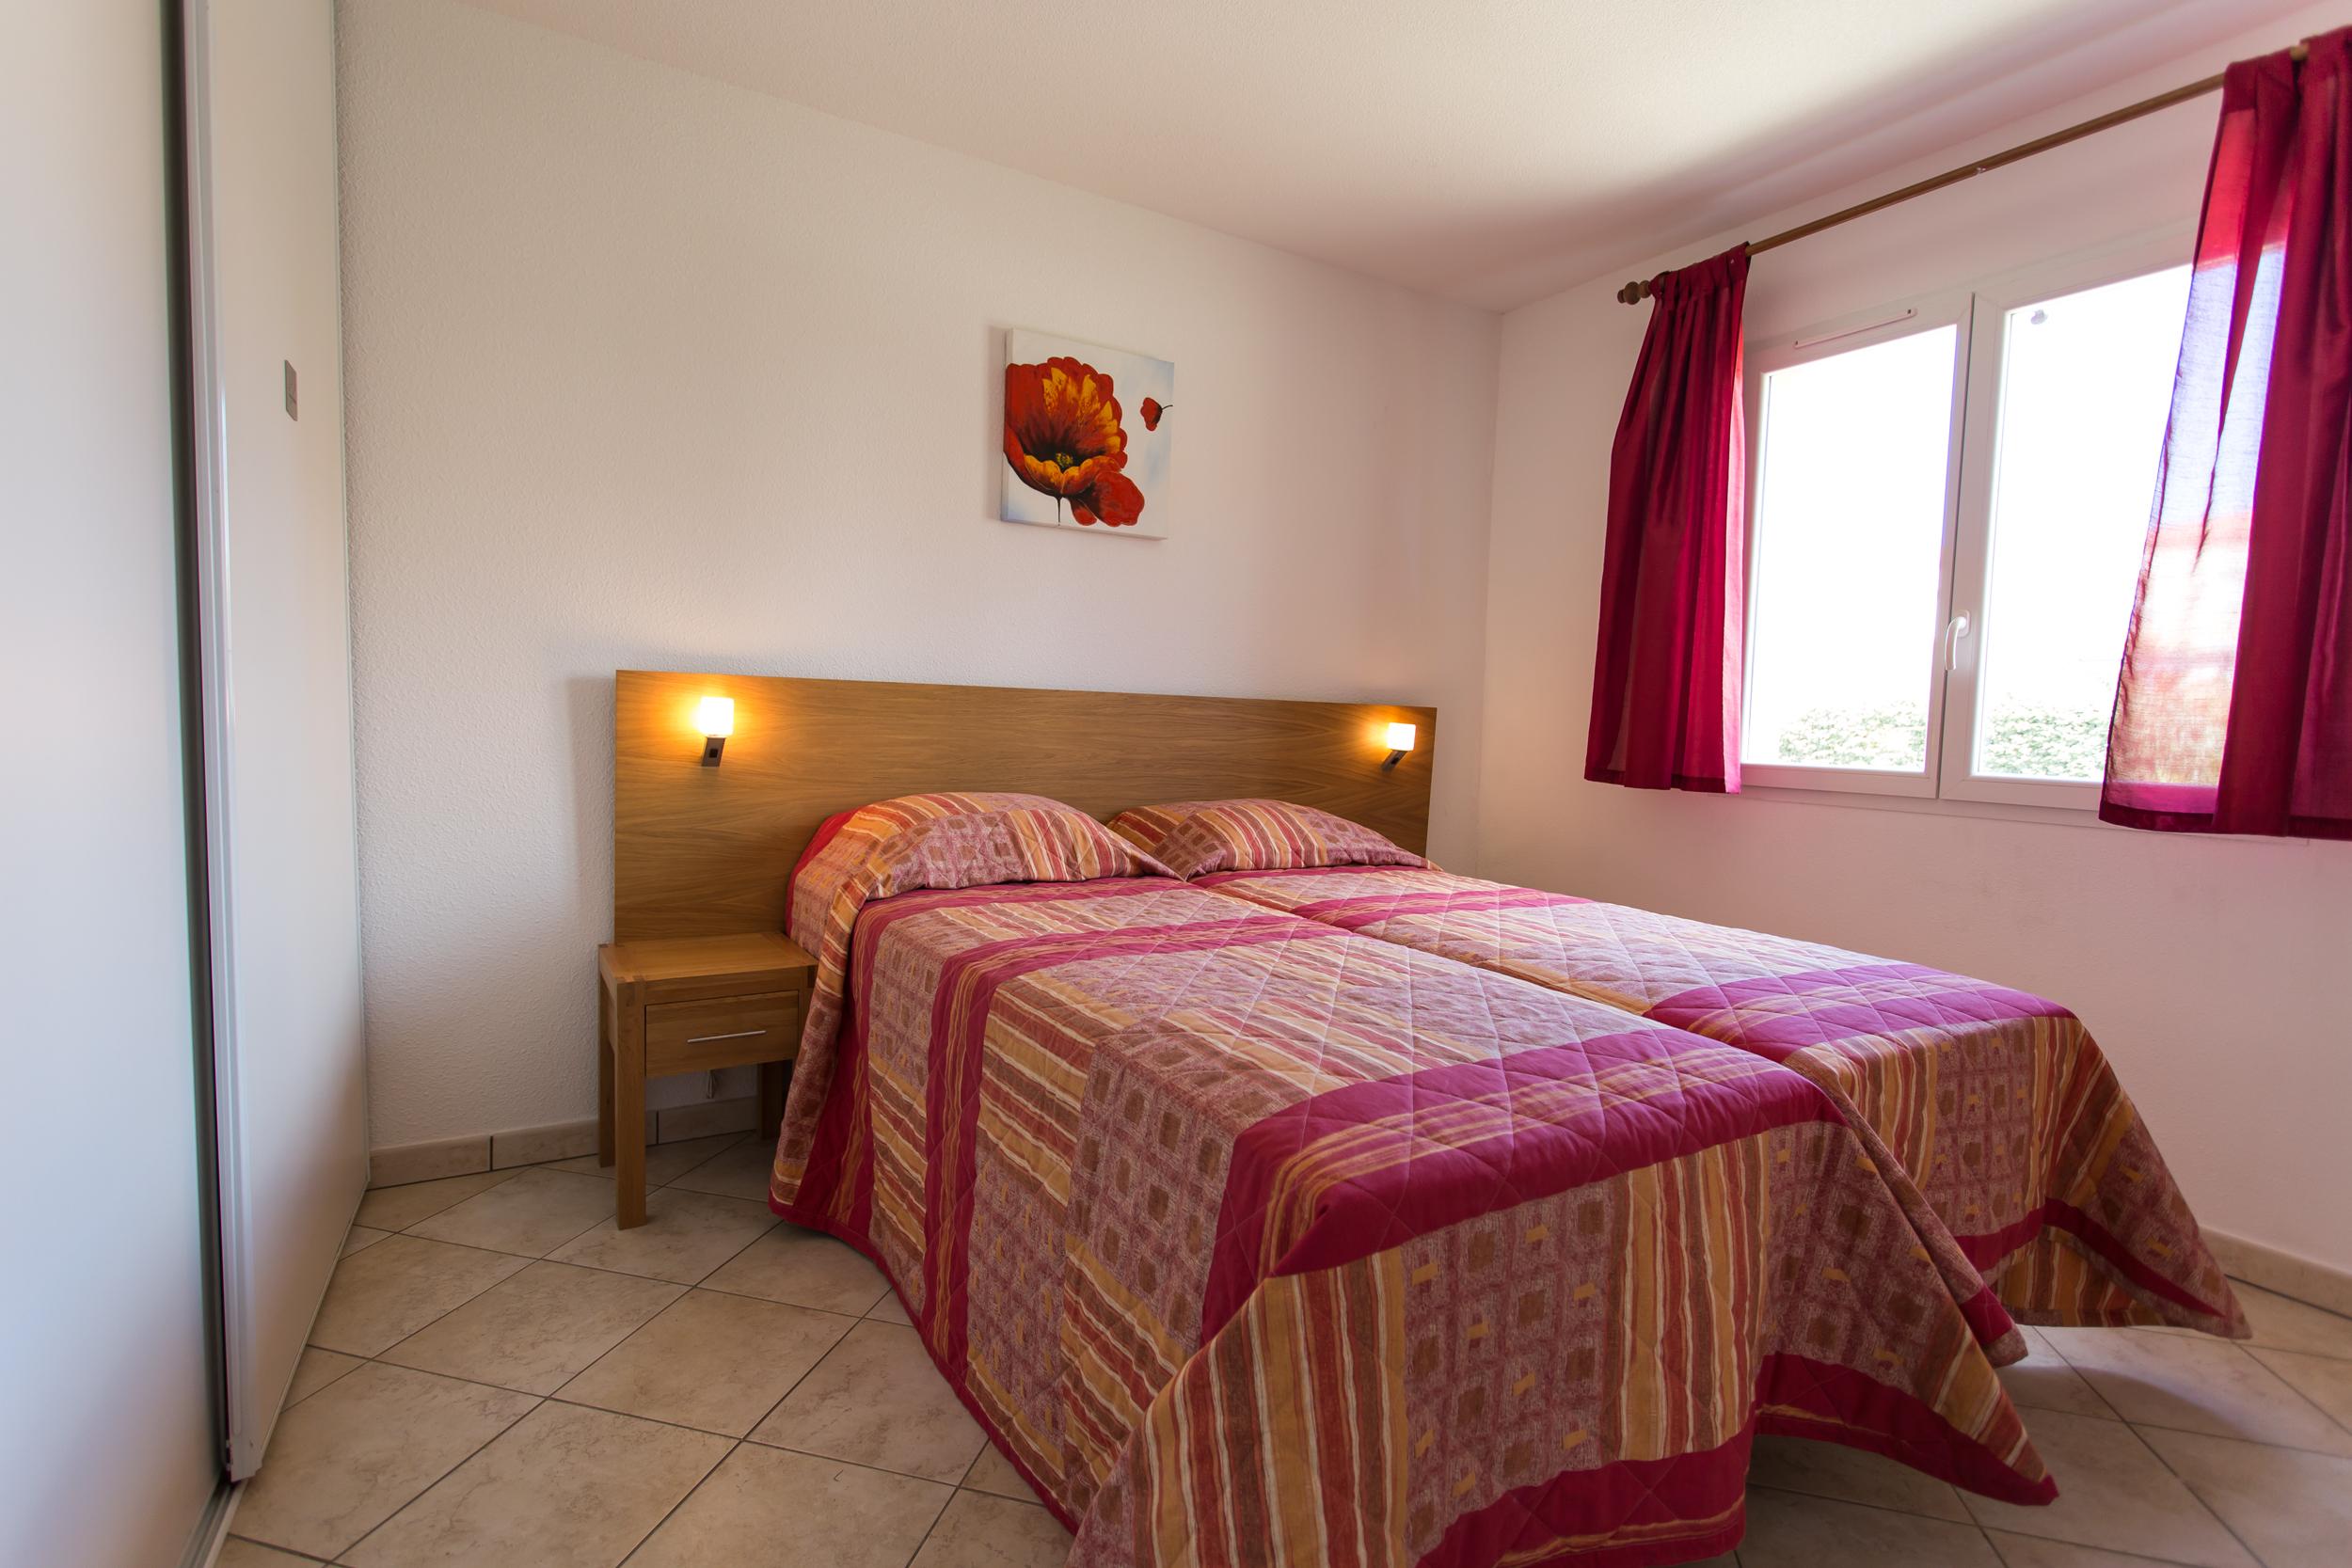 Franse slaapkamer. cheap chateau du rouet with franse slaapkamer